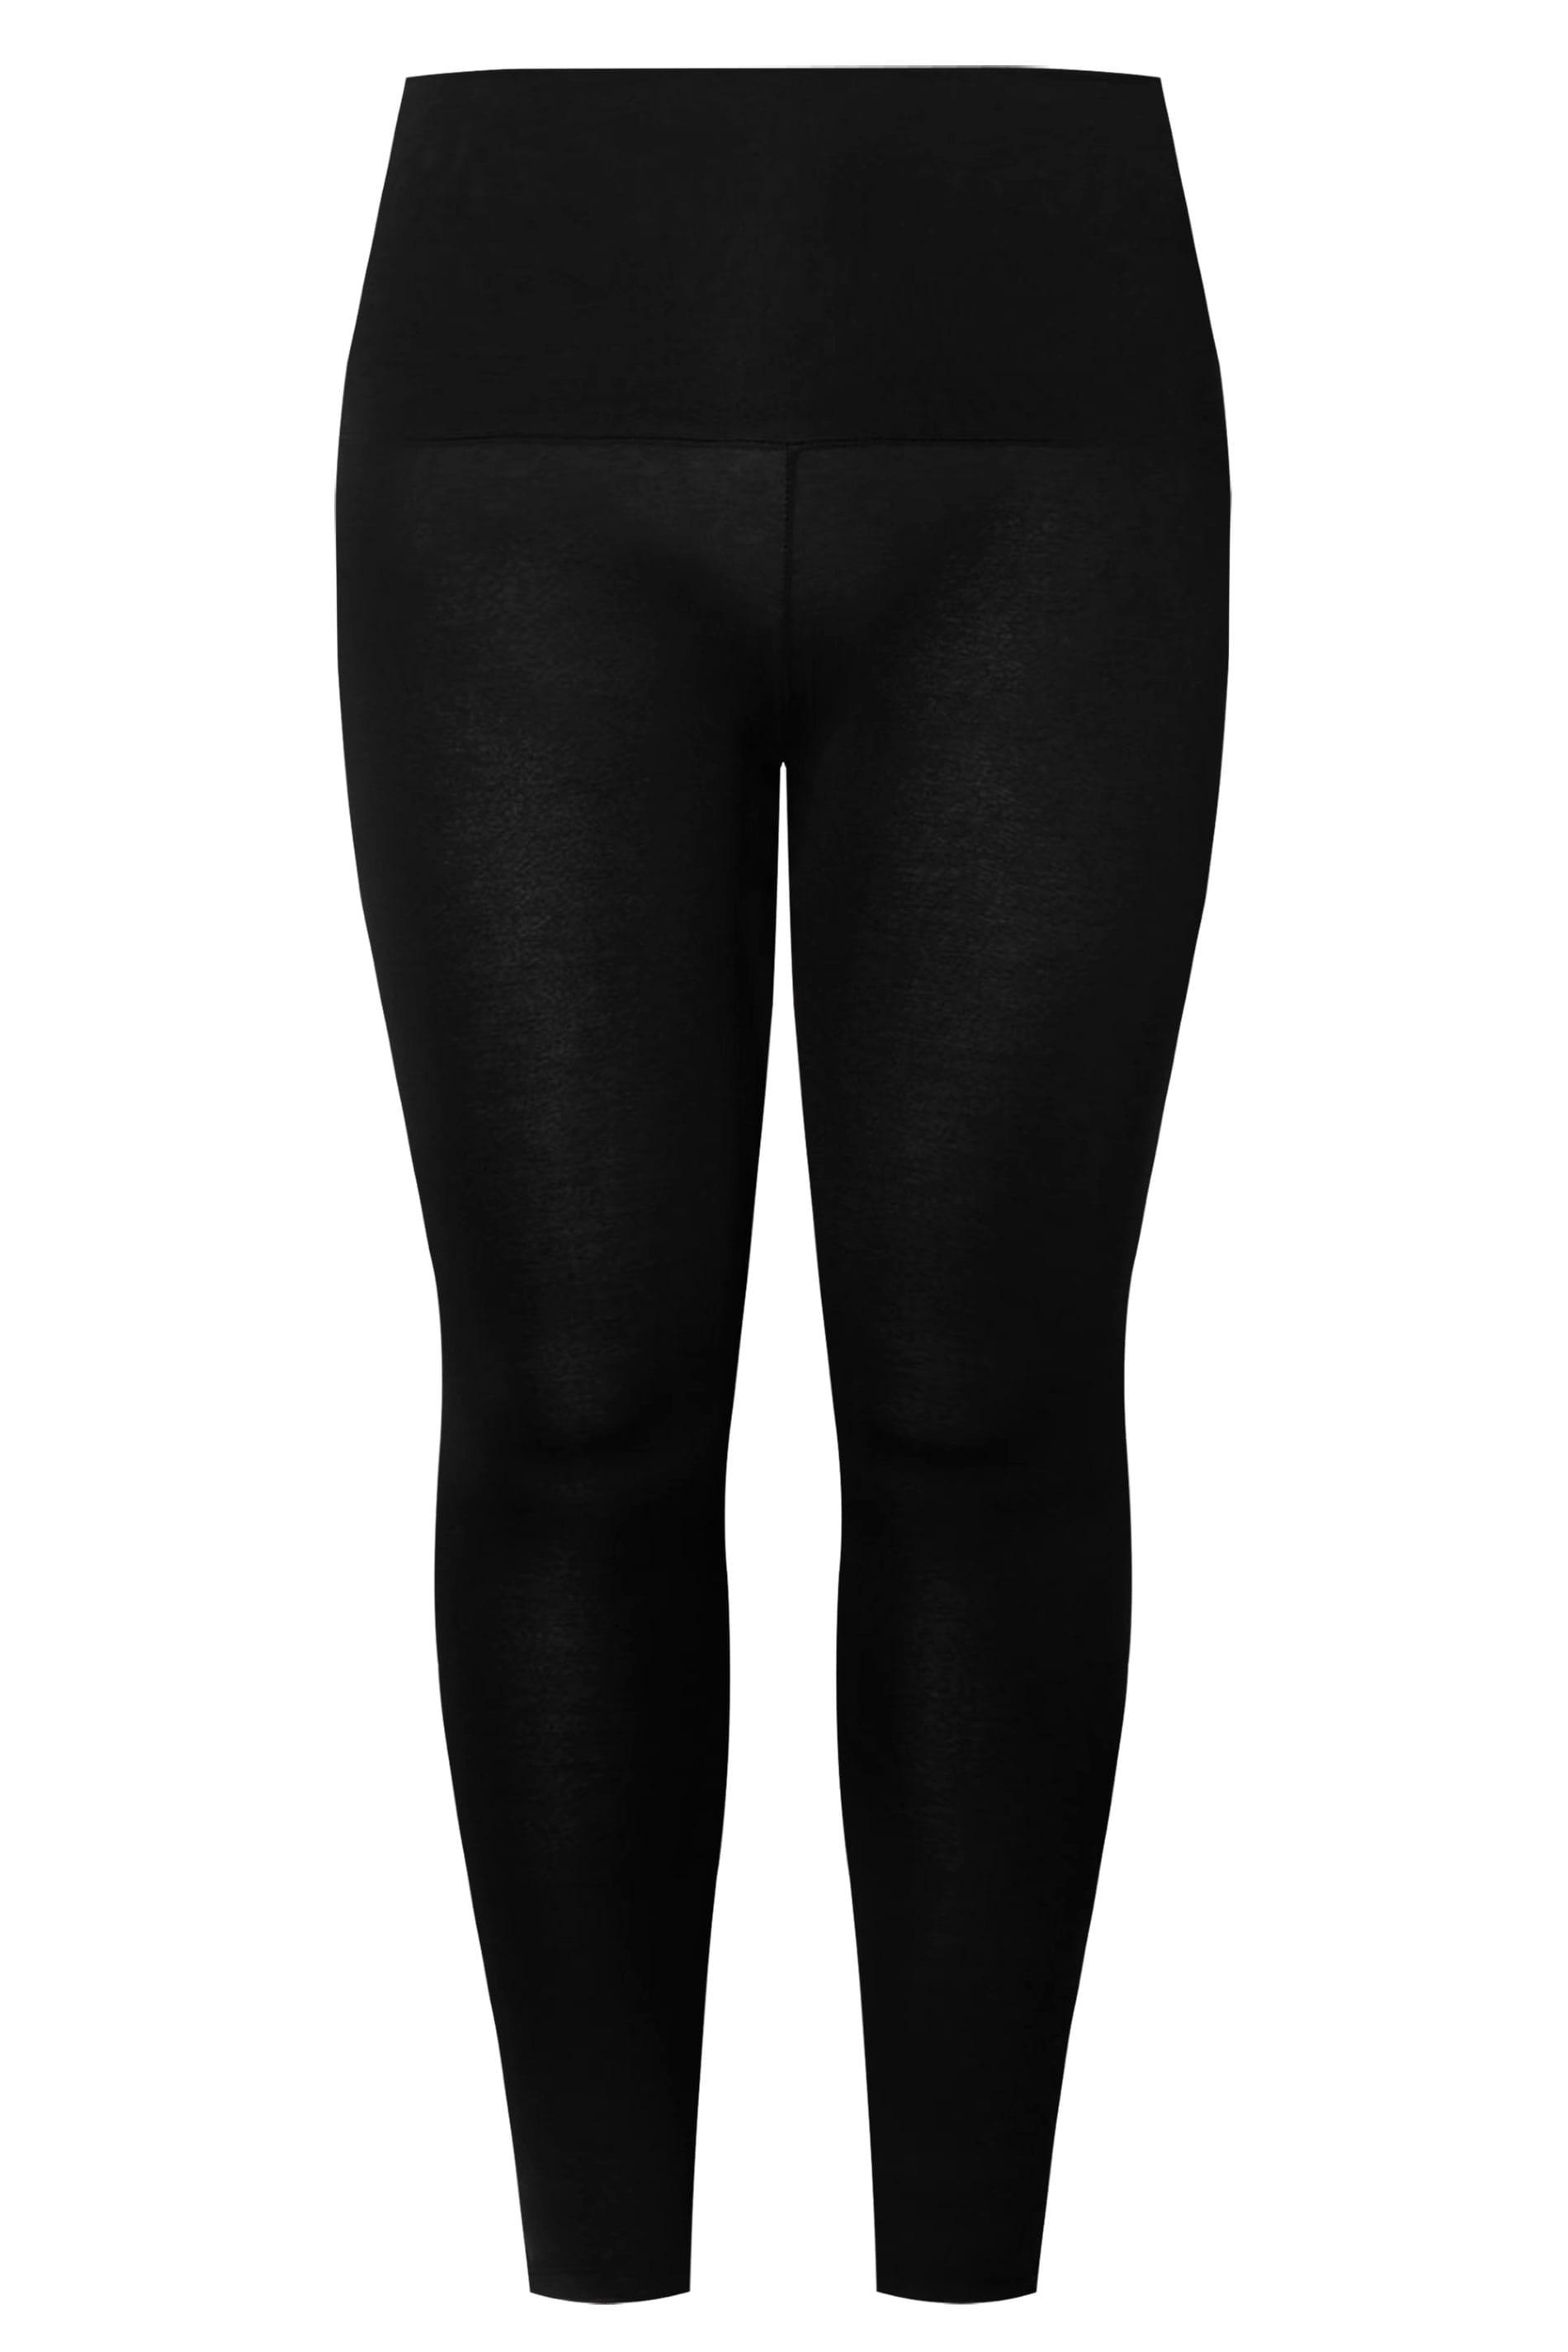 Knee Length High Waist Leggings Pant Viscose Stretch BLACK 20-26 XL Plus Curve